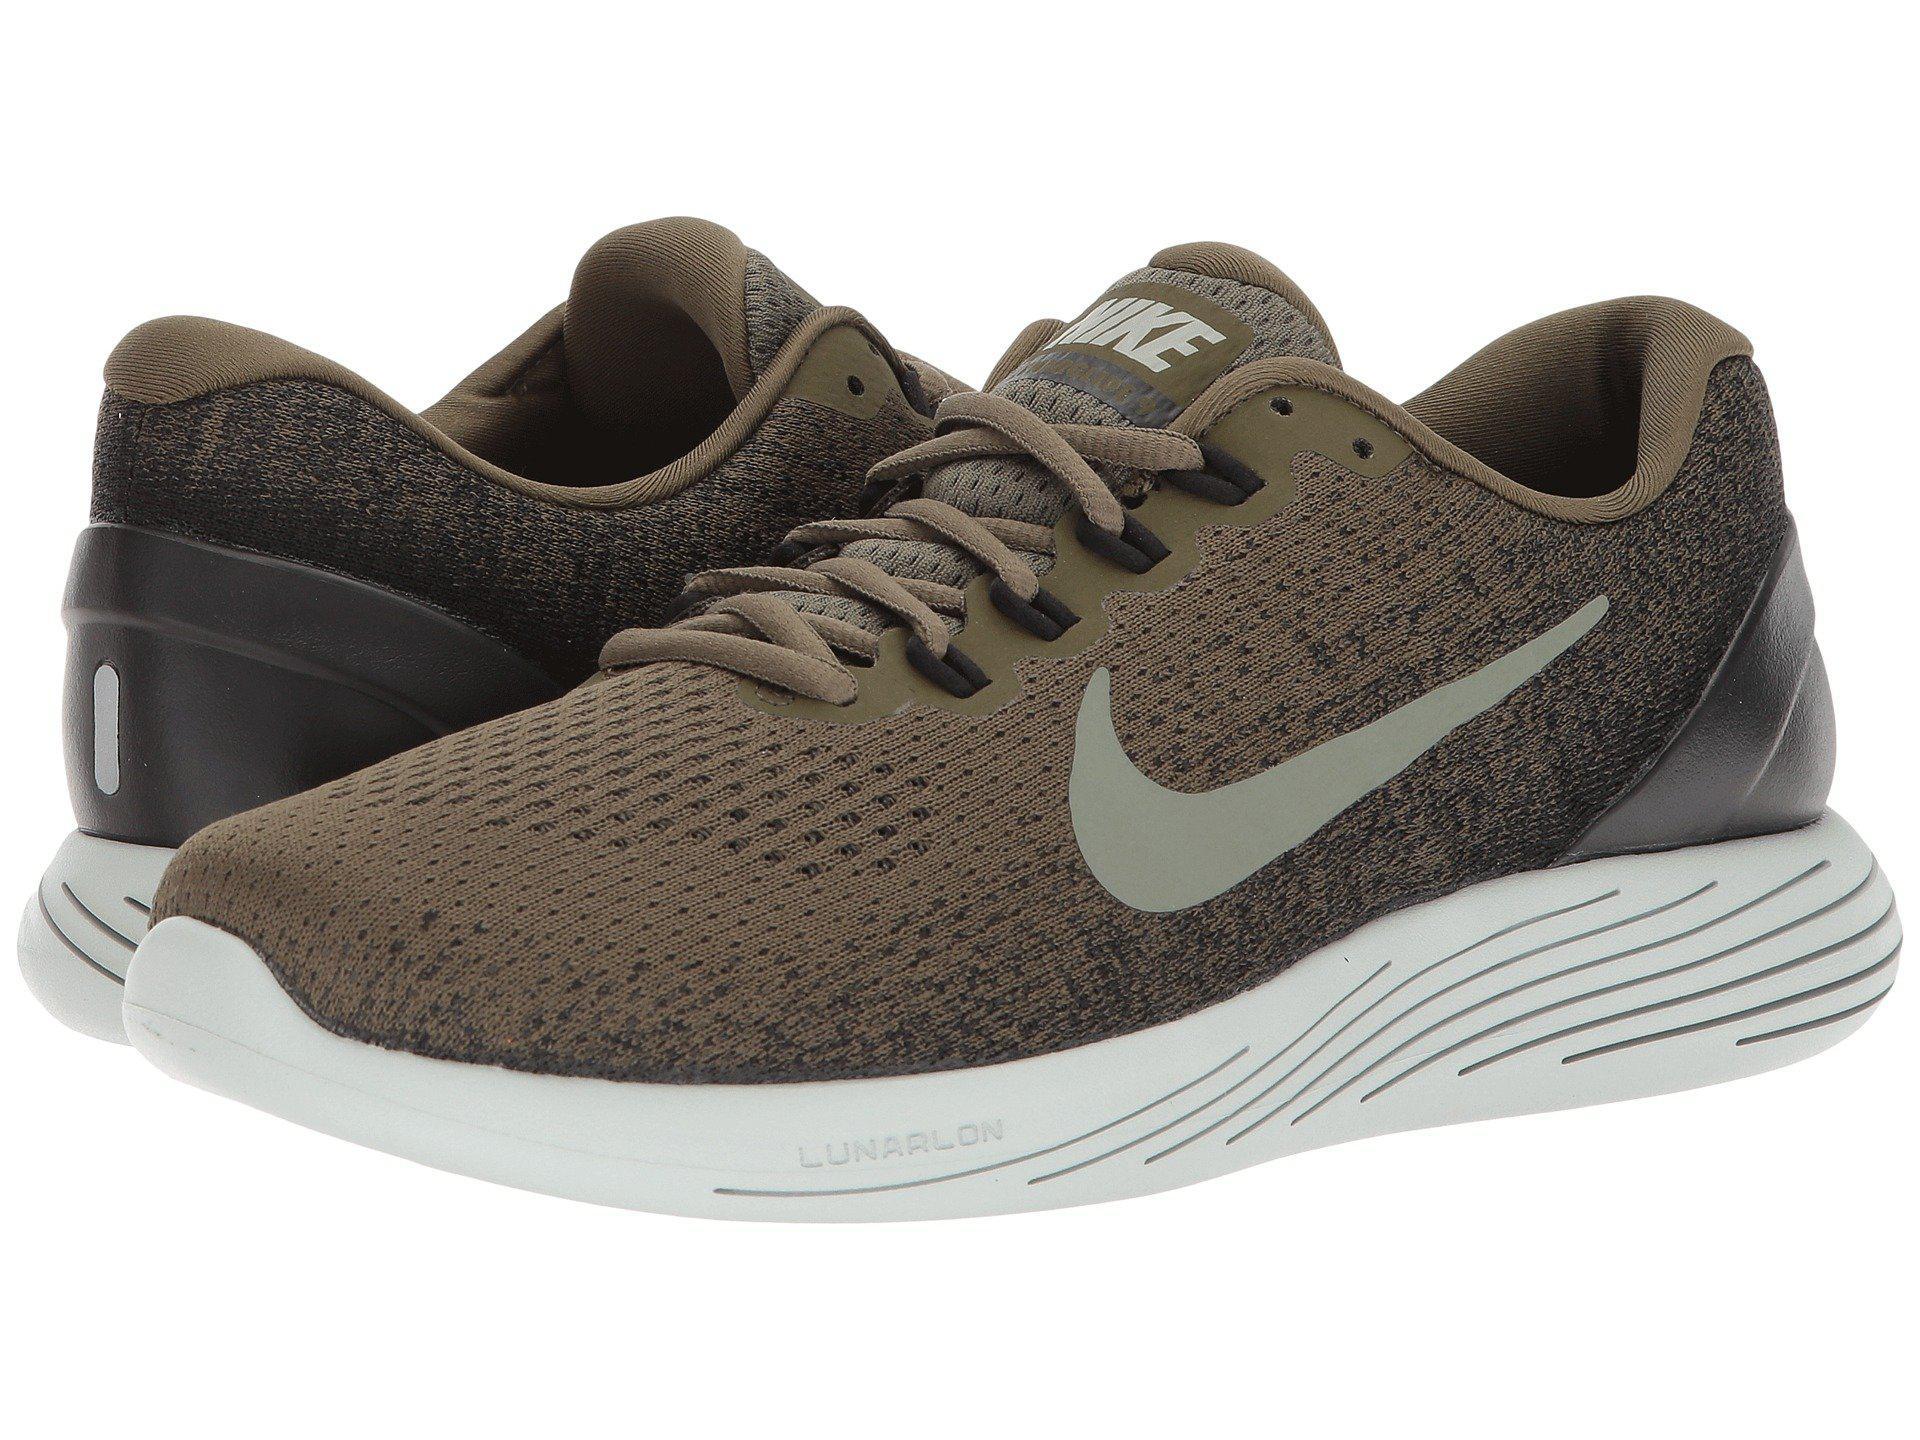 Lyst - Nike Lunarglide 9 for Men - Save 17% d6b859747